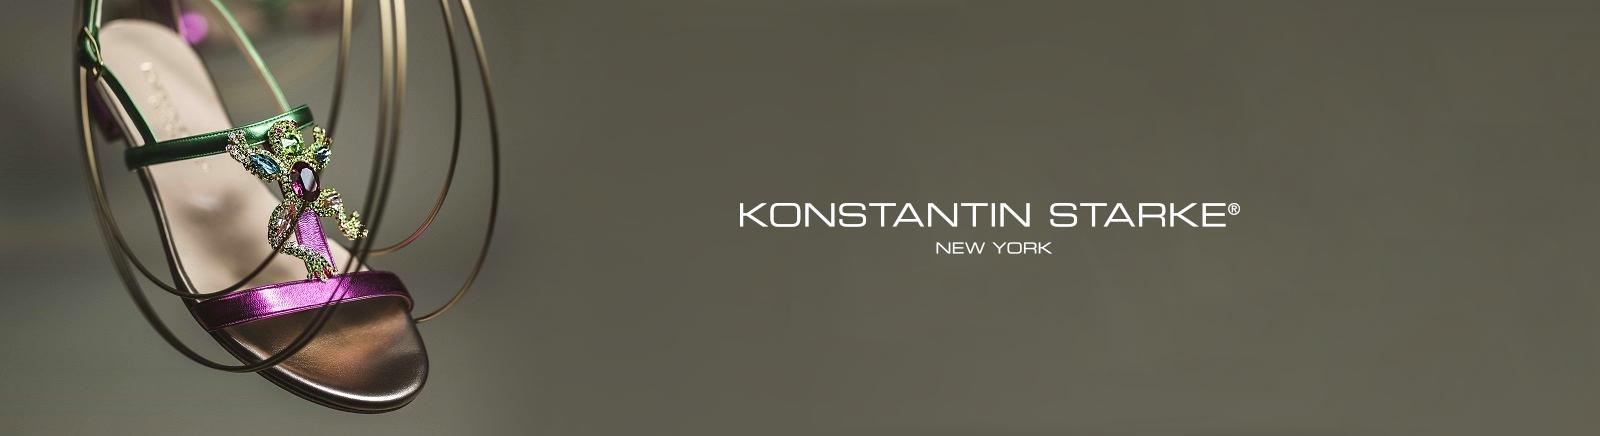 Juppen: Konstantin Starke Plateau-Pumps für Damen online shoppen